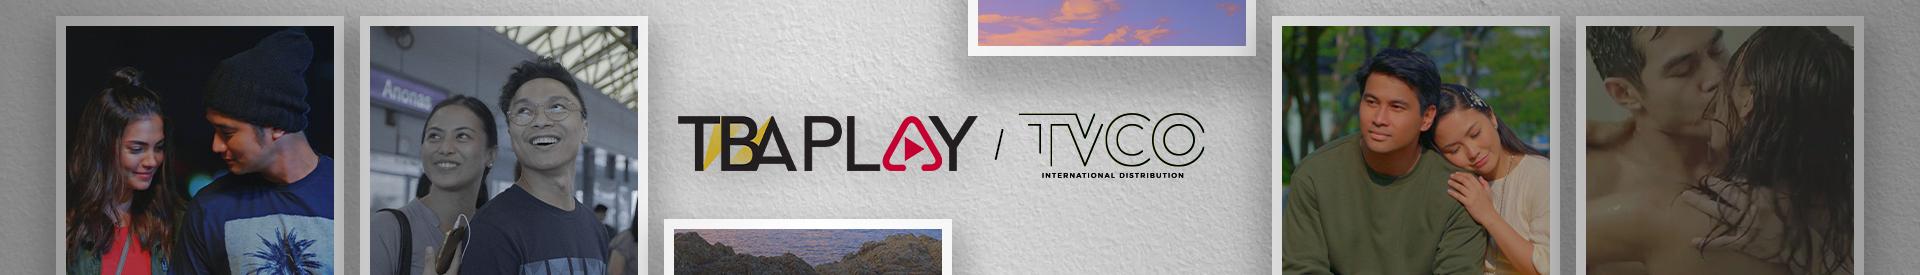 TBA Play @ TVCO